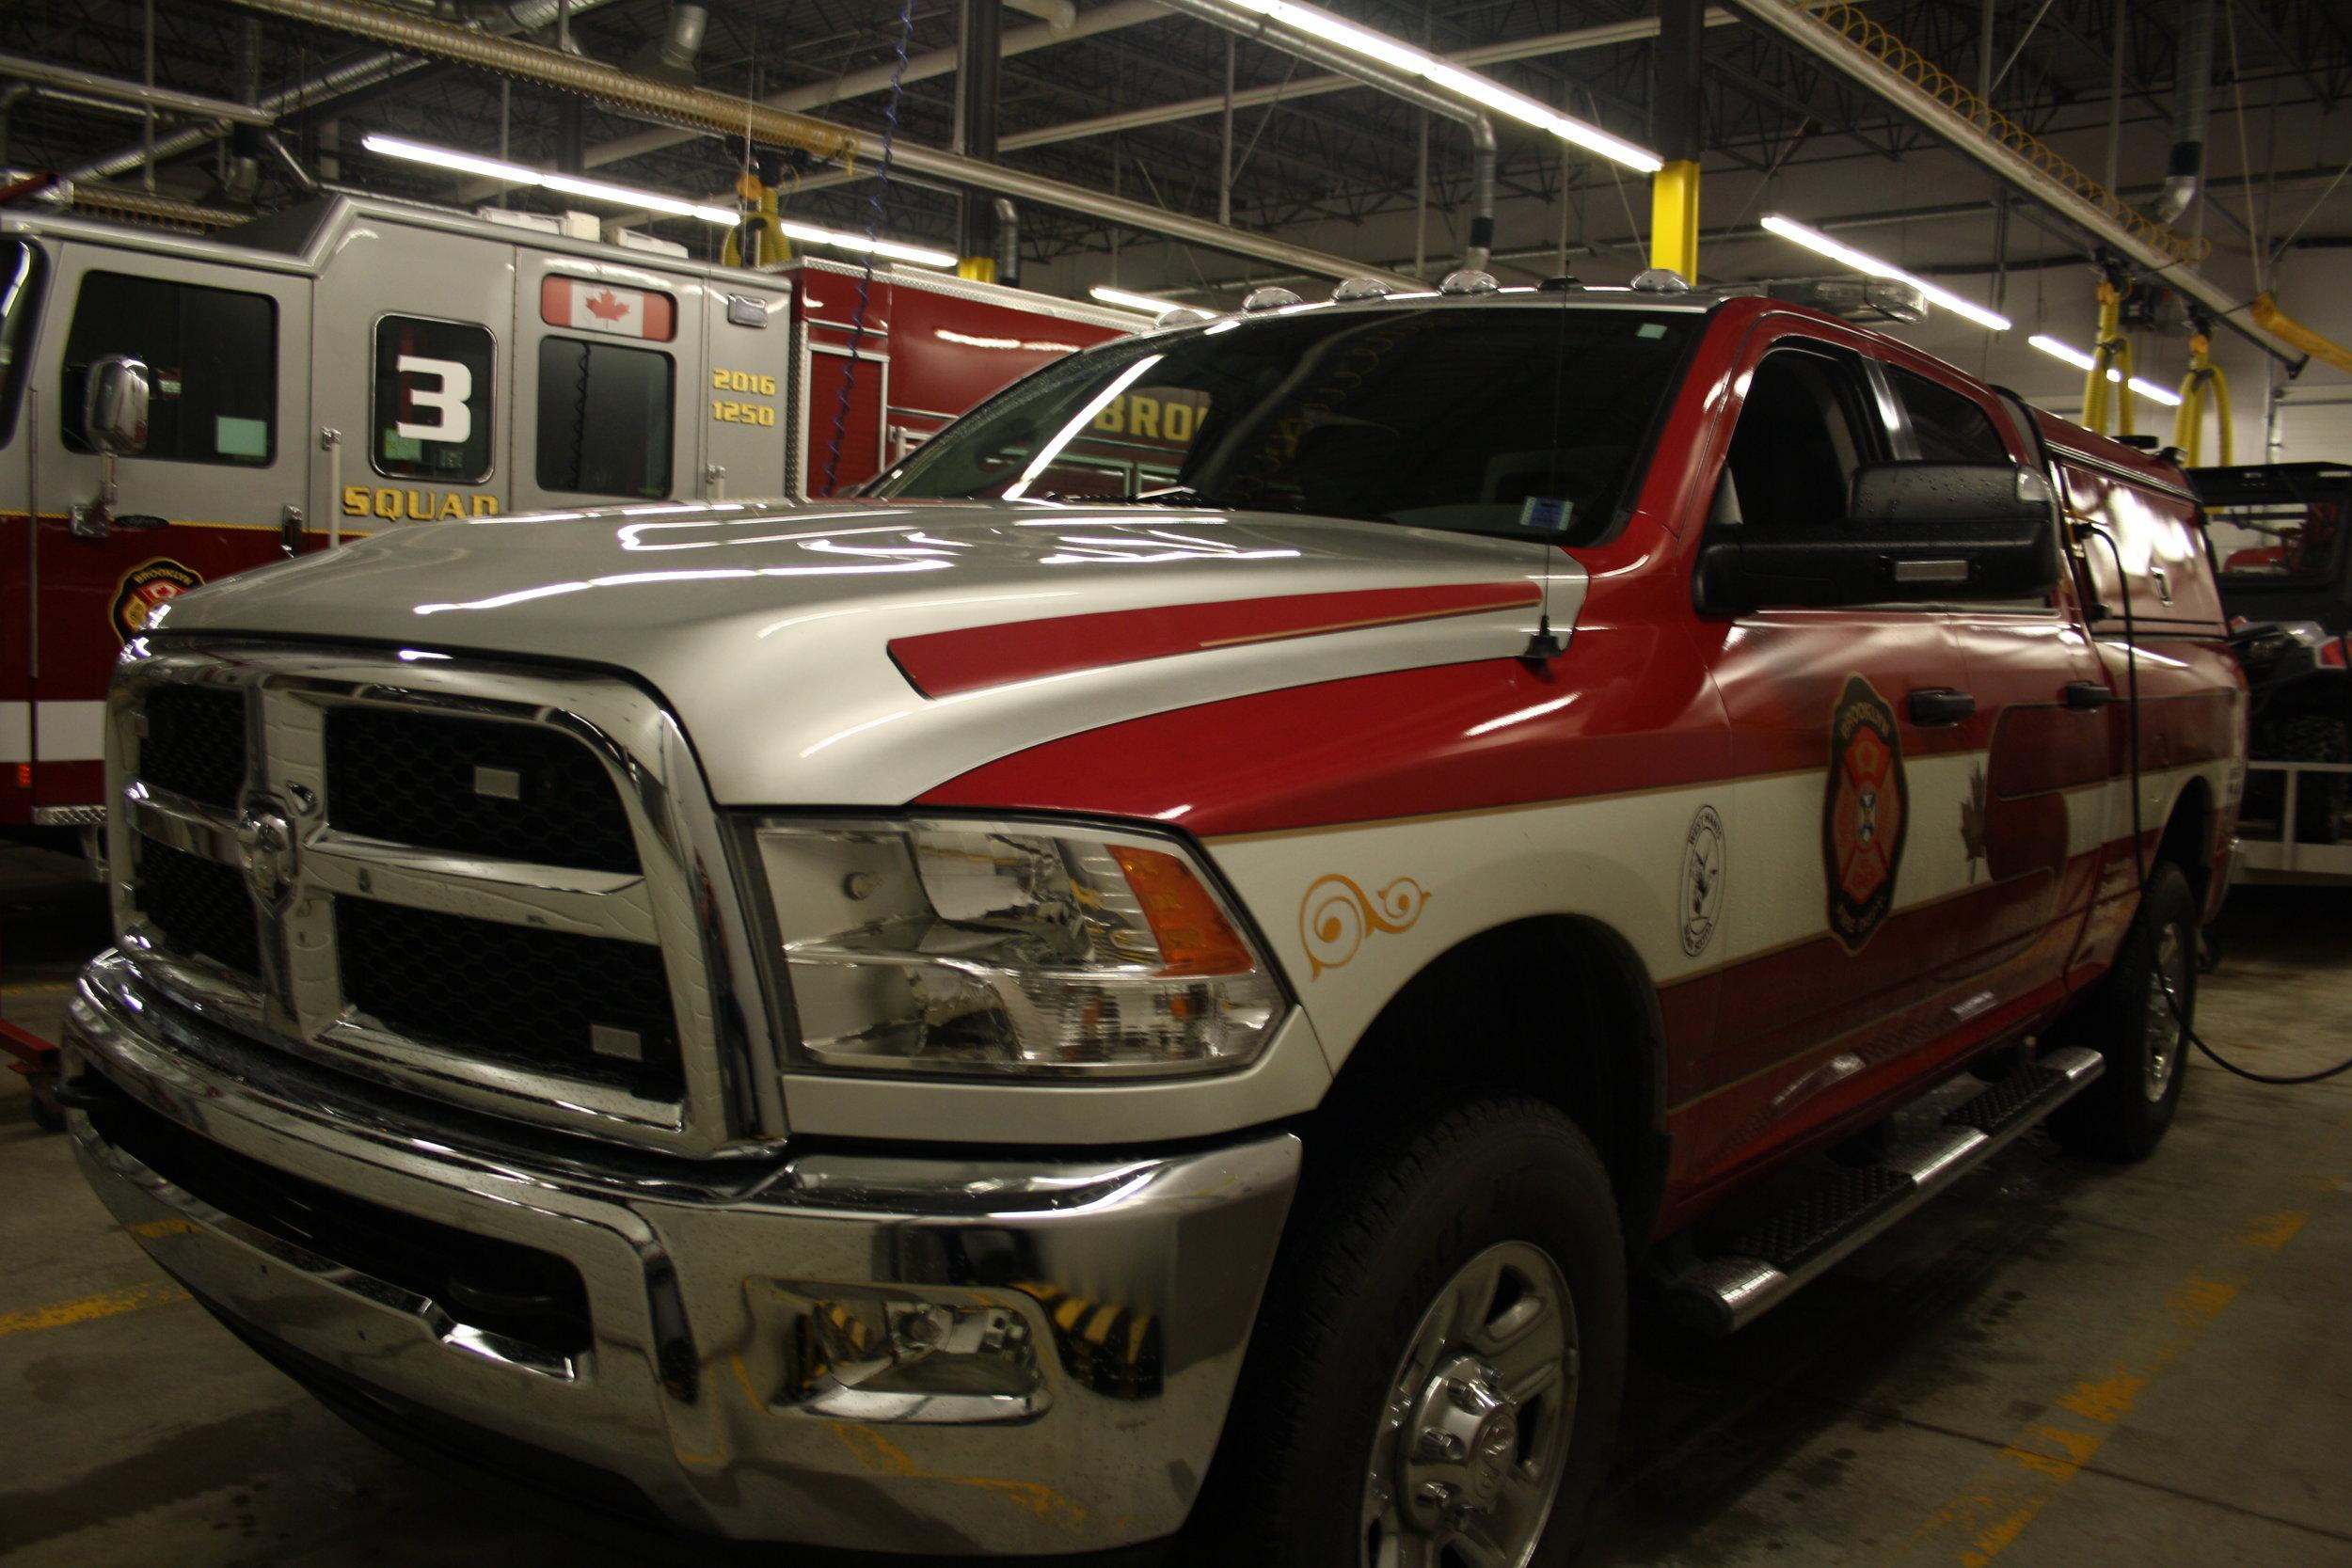 Rescue Seven is a 2015 Dodge Ram 3500 Four Wheel Drive.